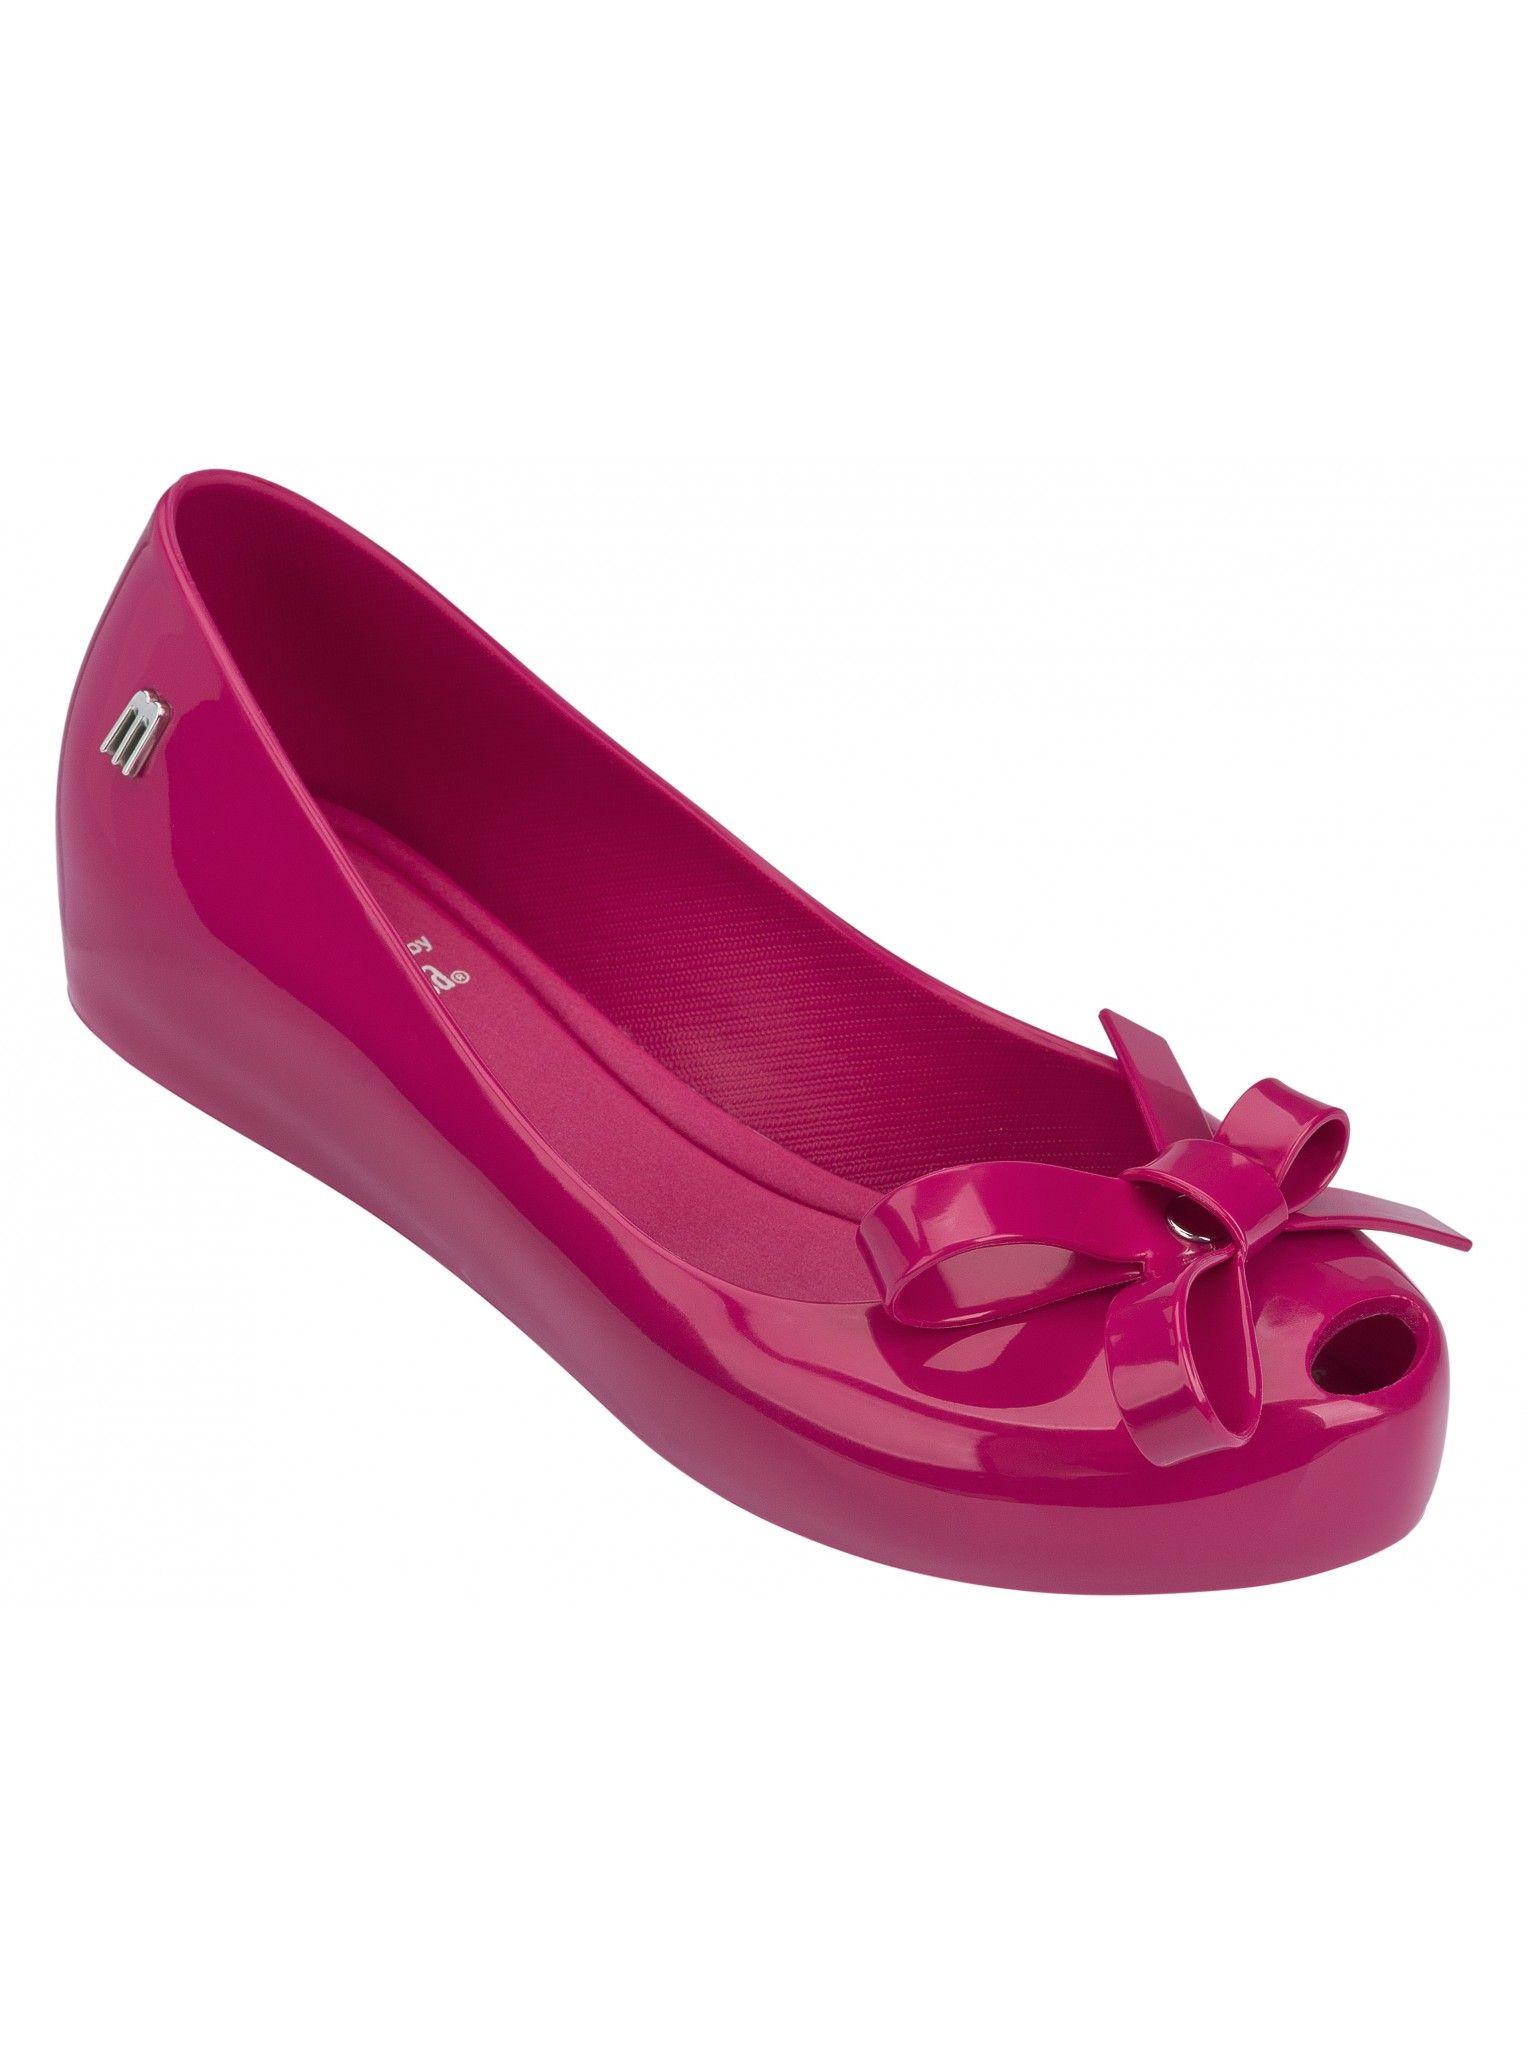 Kids Ultragirl Tie Pink | Melissa Shoes for Kids | NONNON.co.uk